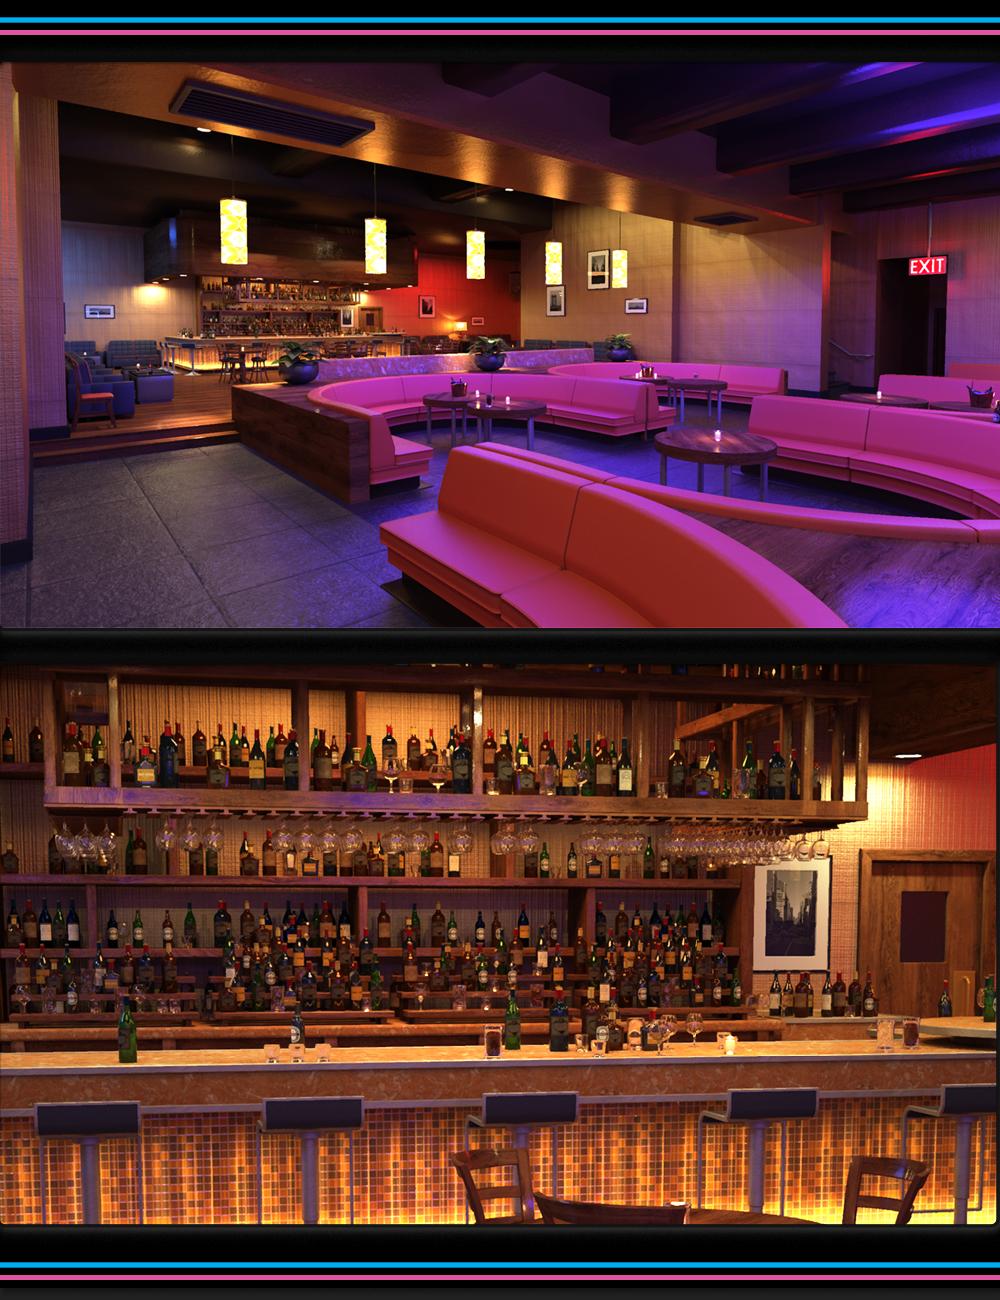 Night Lounge Iray by: Marshian, 3D Models by Daz 3D